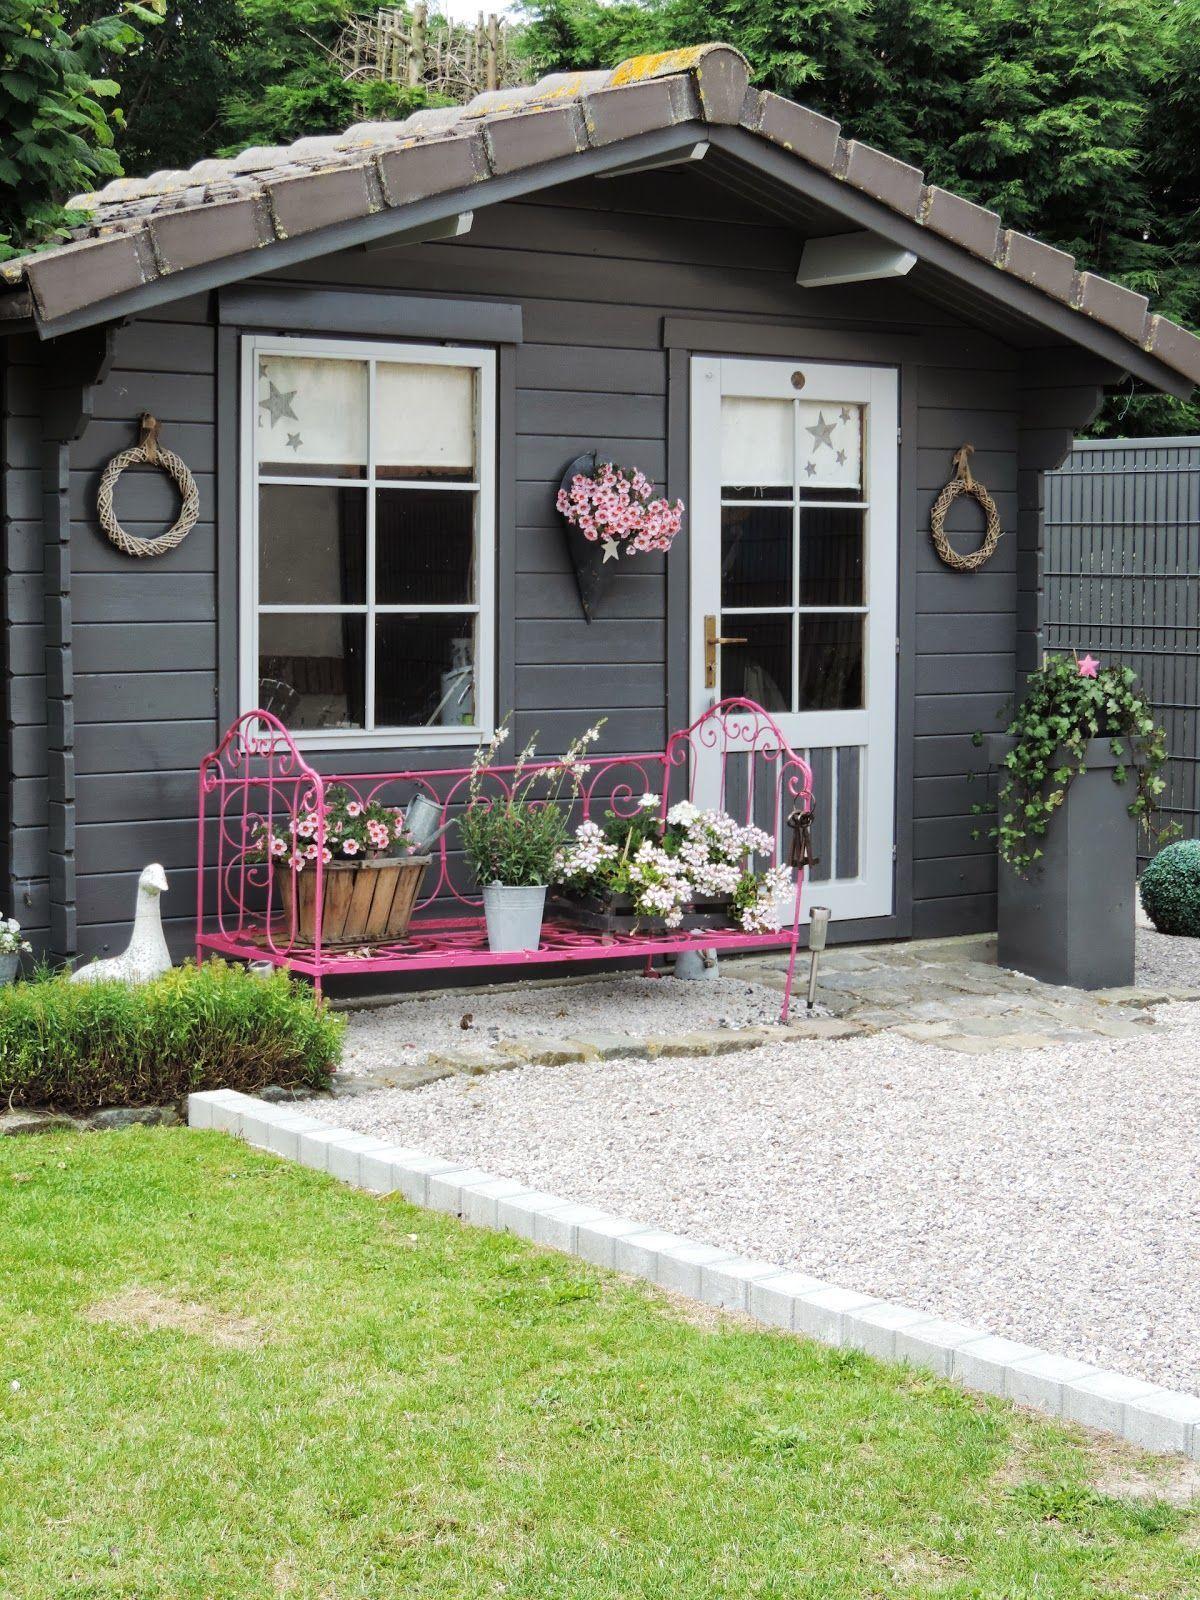 Épinglé sur GROEN ✽ Tuinhuisje  Shed